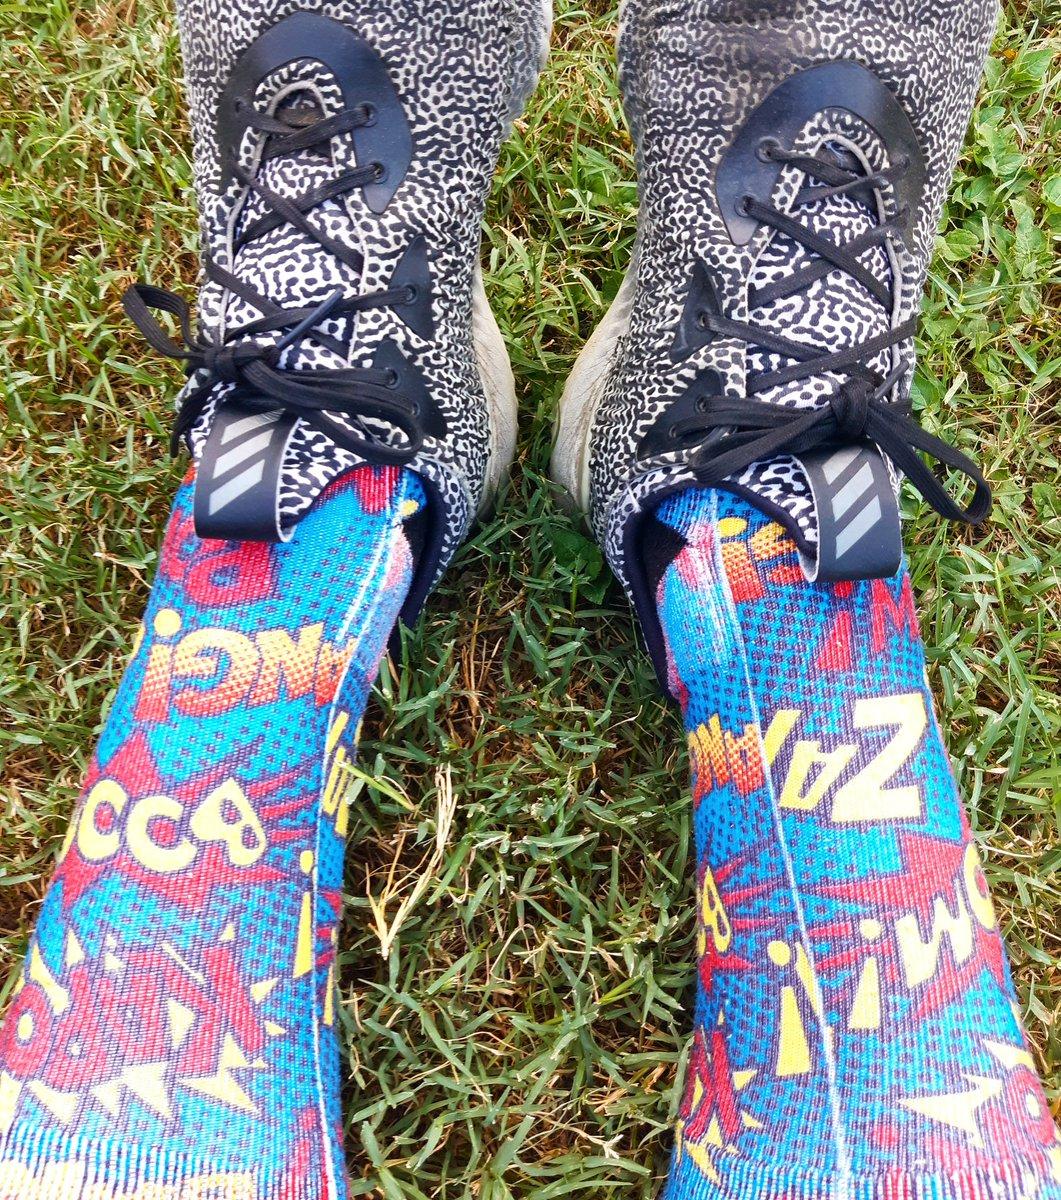 Na na na na na na Batman, boom, kappa, bang! Socks & Adidas Aramis Alphabounce #nananananabatman #batman #kapow #bam #lootcrate #sharethewear @lootcrate @lootwear #socks #ootd #sotd #shoes #adidas @adidasoriginals @adidasrunning #adidasarsmis #alphabounce @adidasalphabounce https://t.co/uVGVCvpCv2